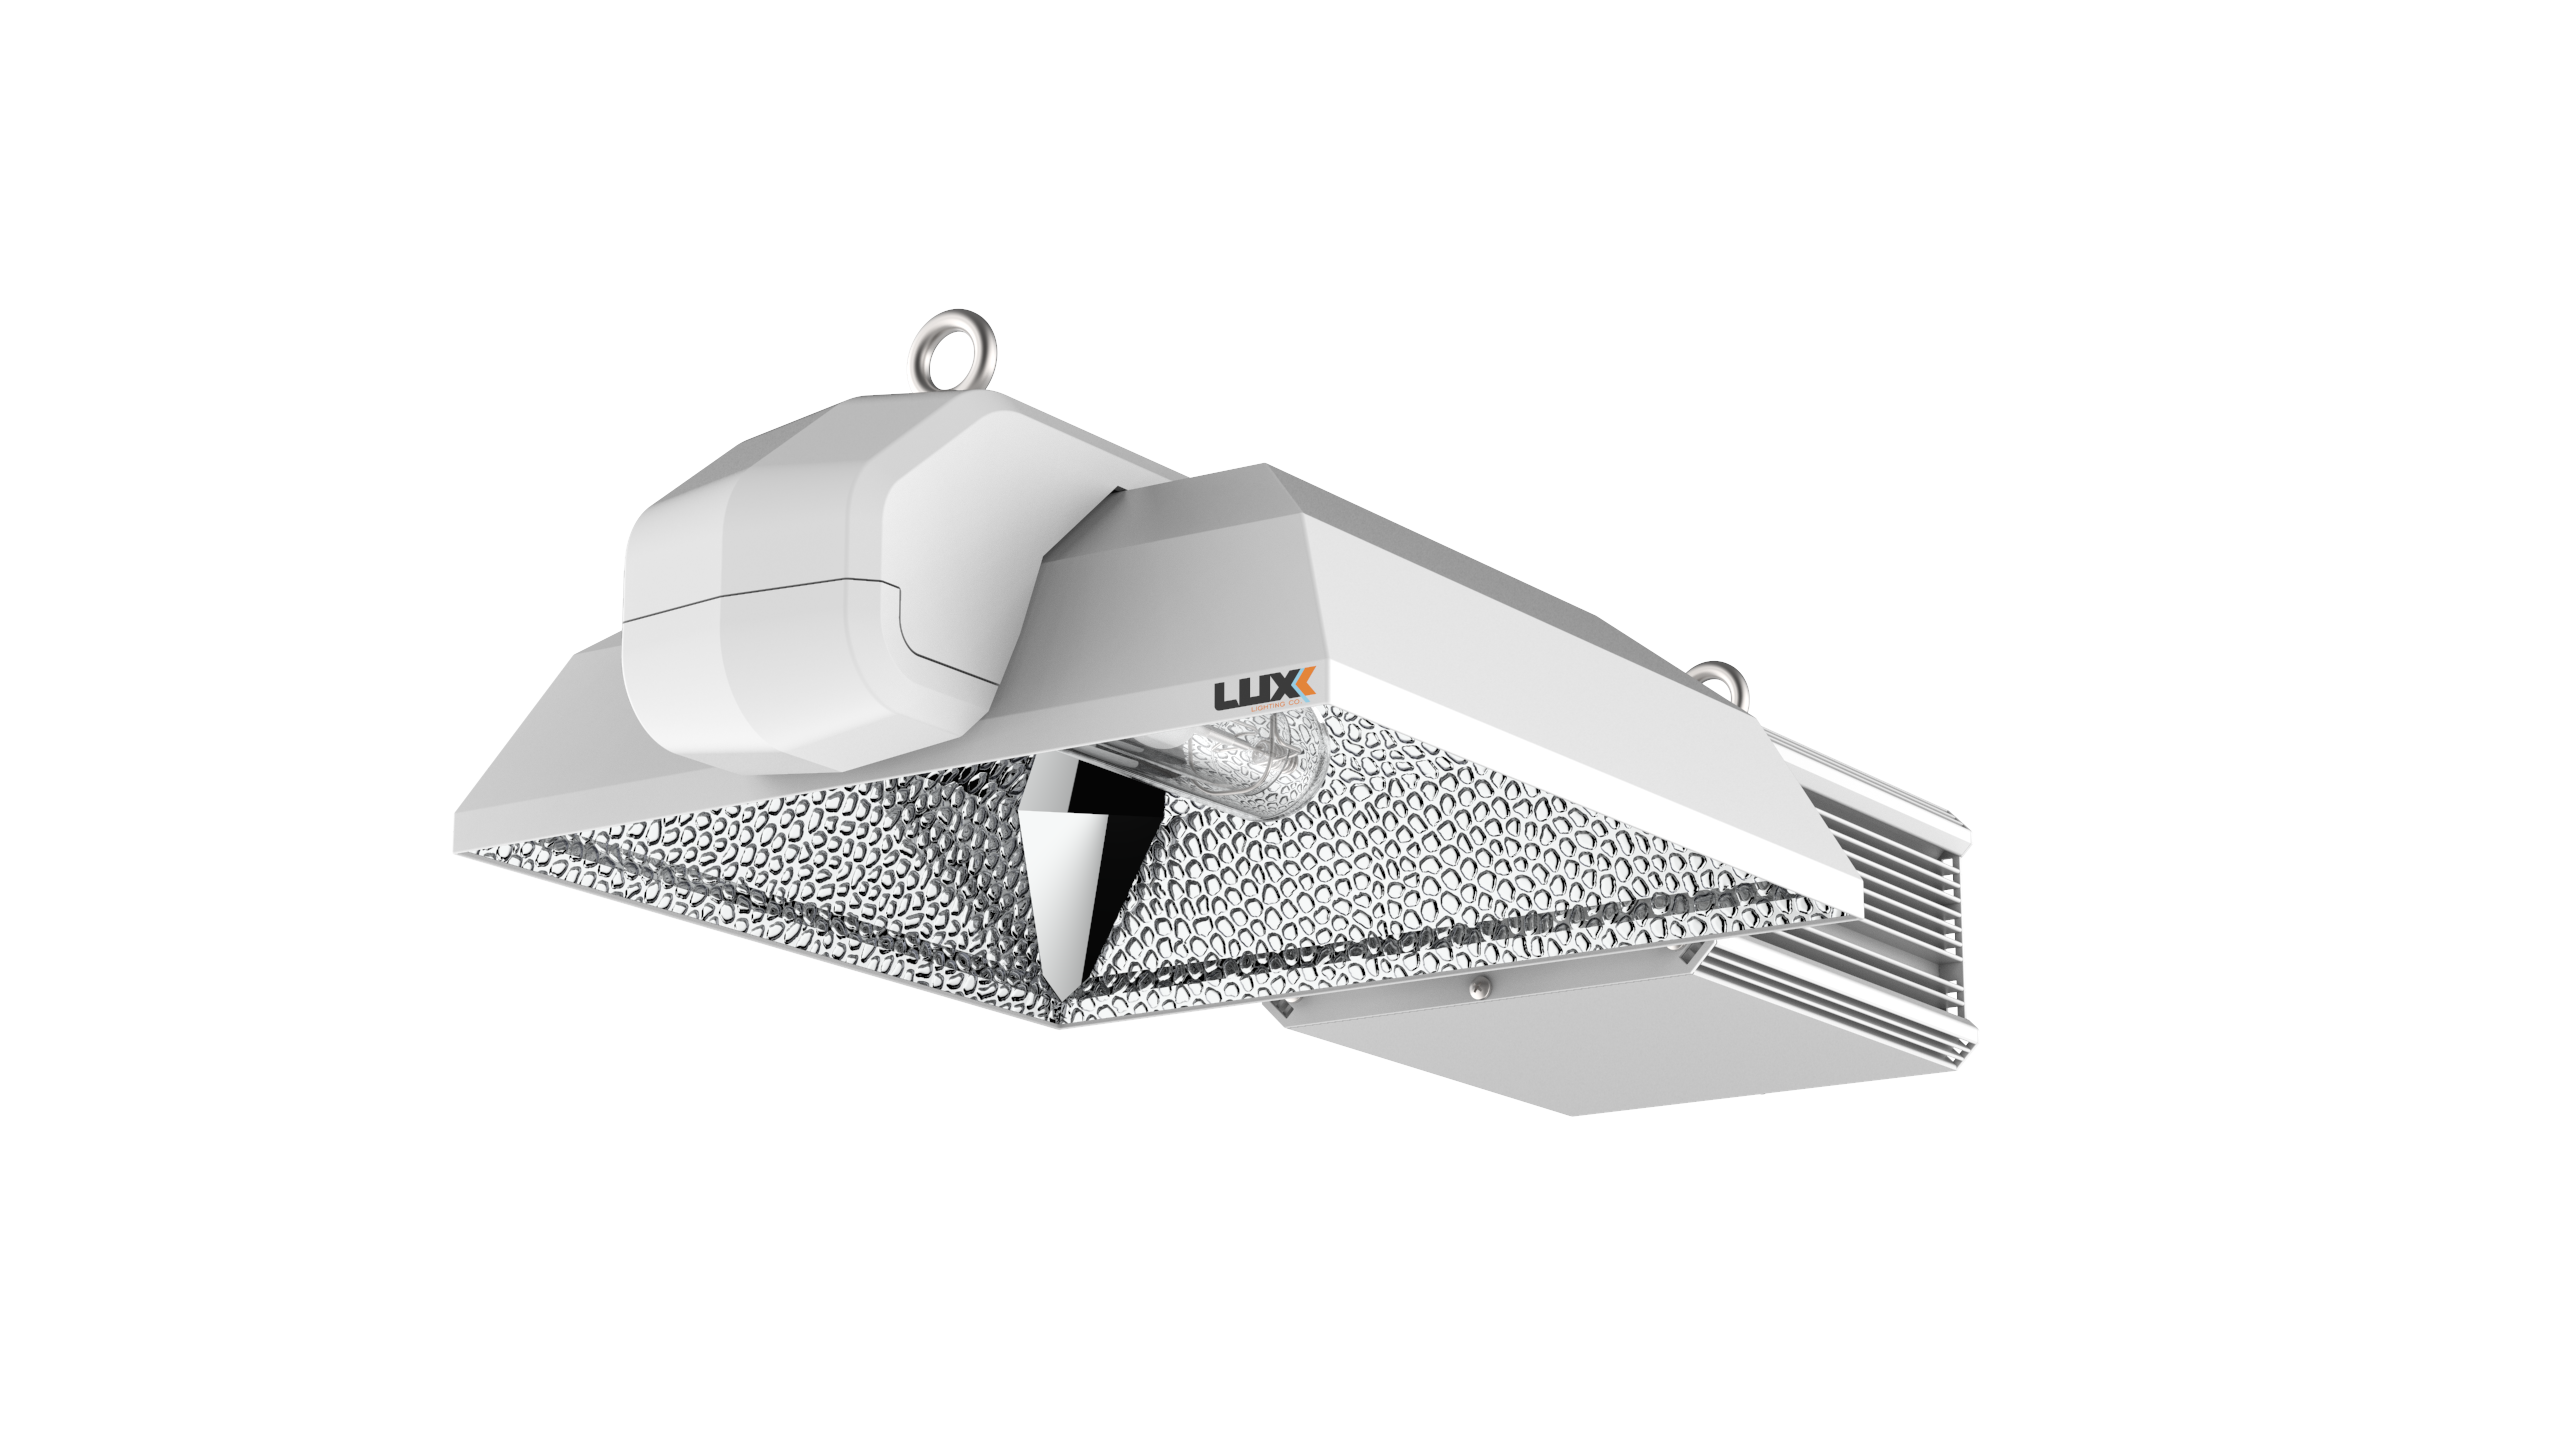 LUXX FIXTURE - CMH 315 WATTS - 120V - 277V + AMP 4200°K (1)